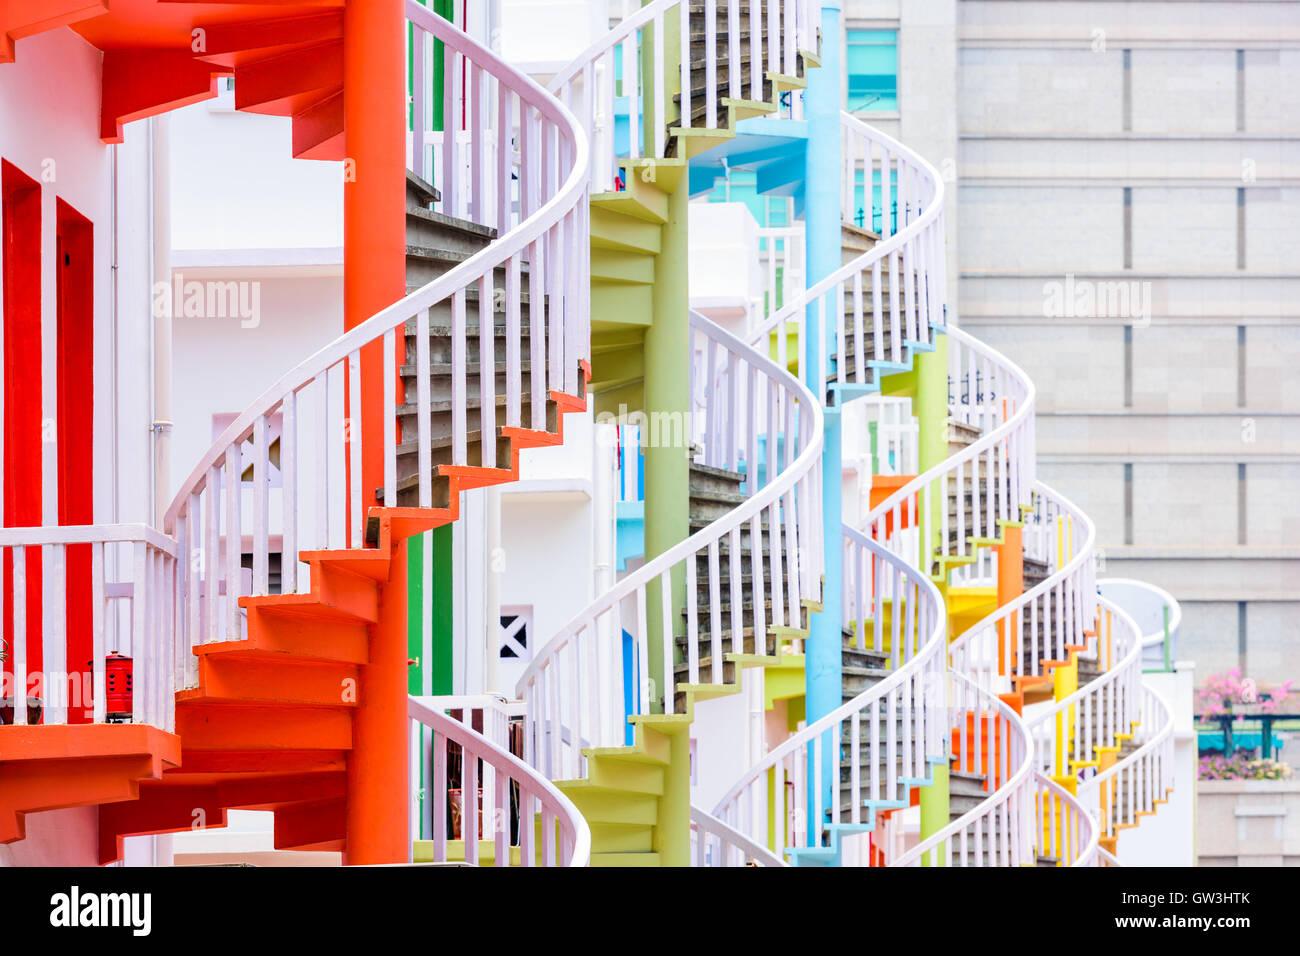 Singapore at Bugis Village spiral staircases. - Stock Image